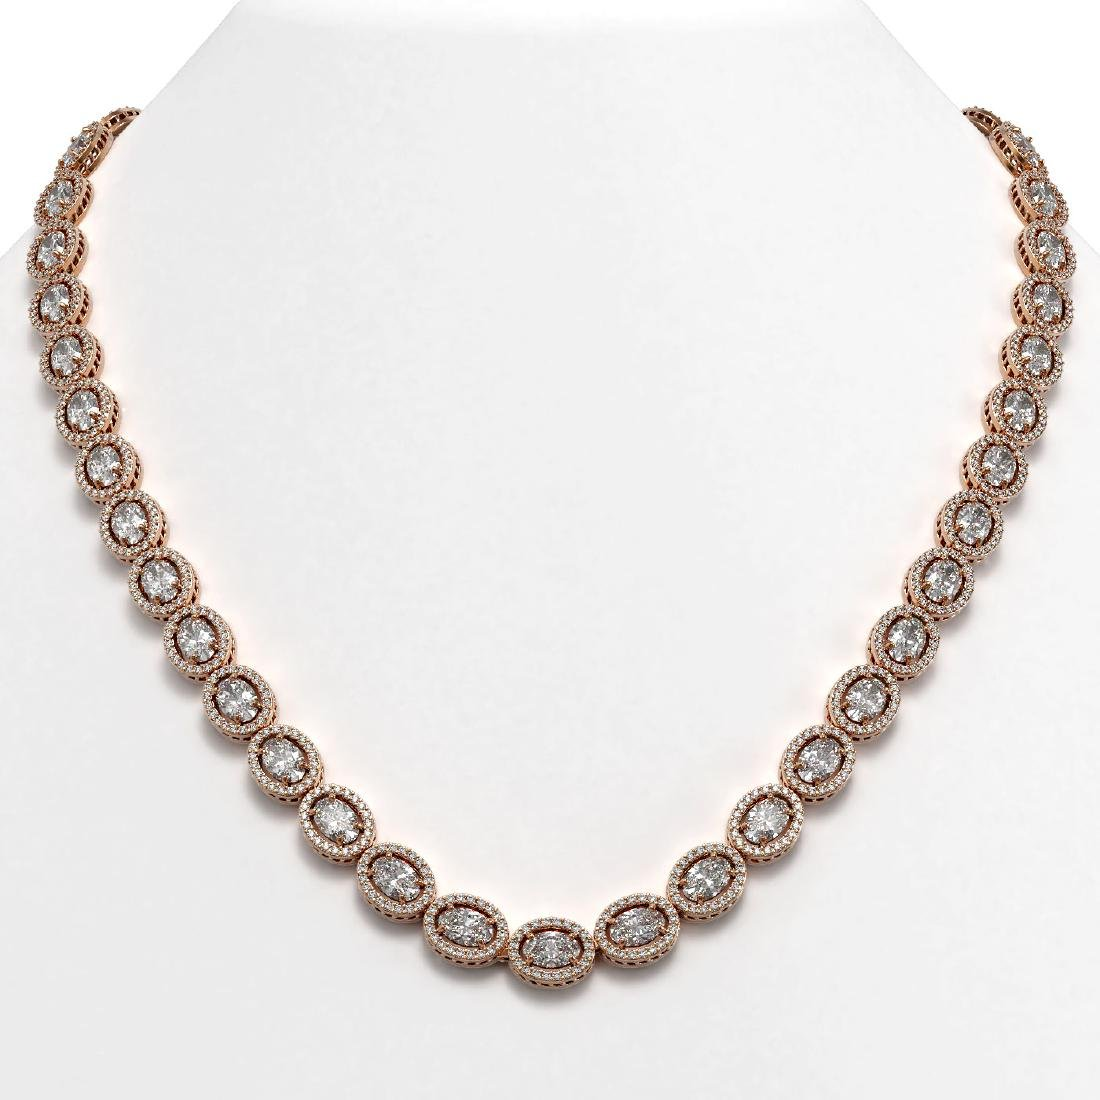 30.41 CTW Oval Diamond Designer Necklace 18K Rose Gold